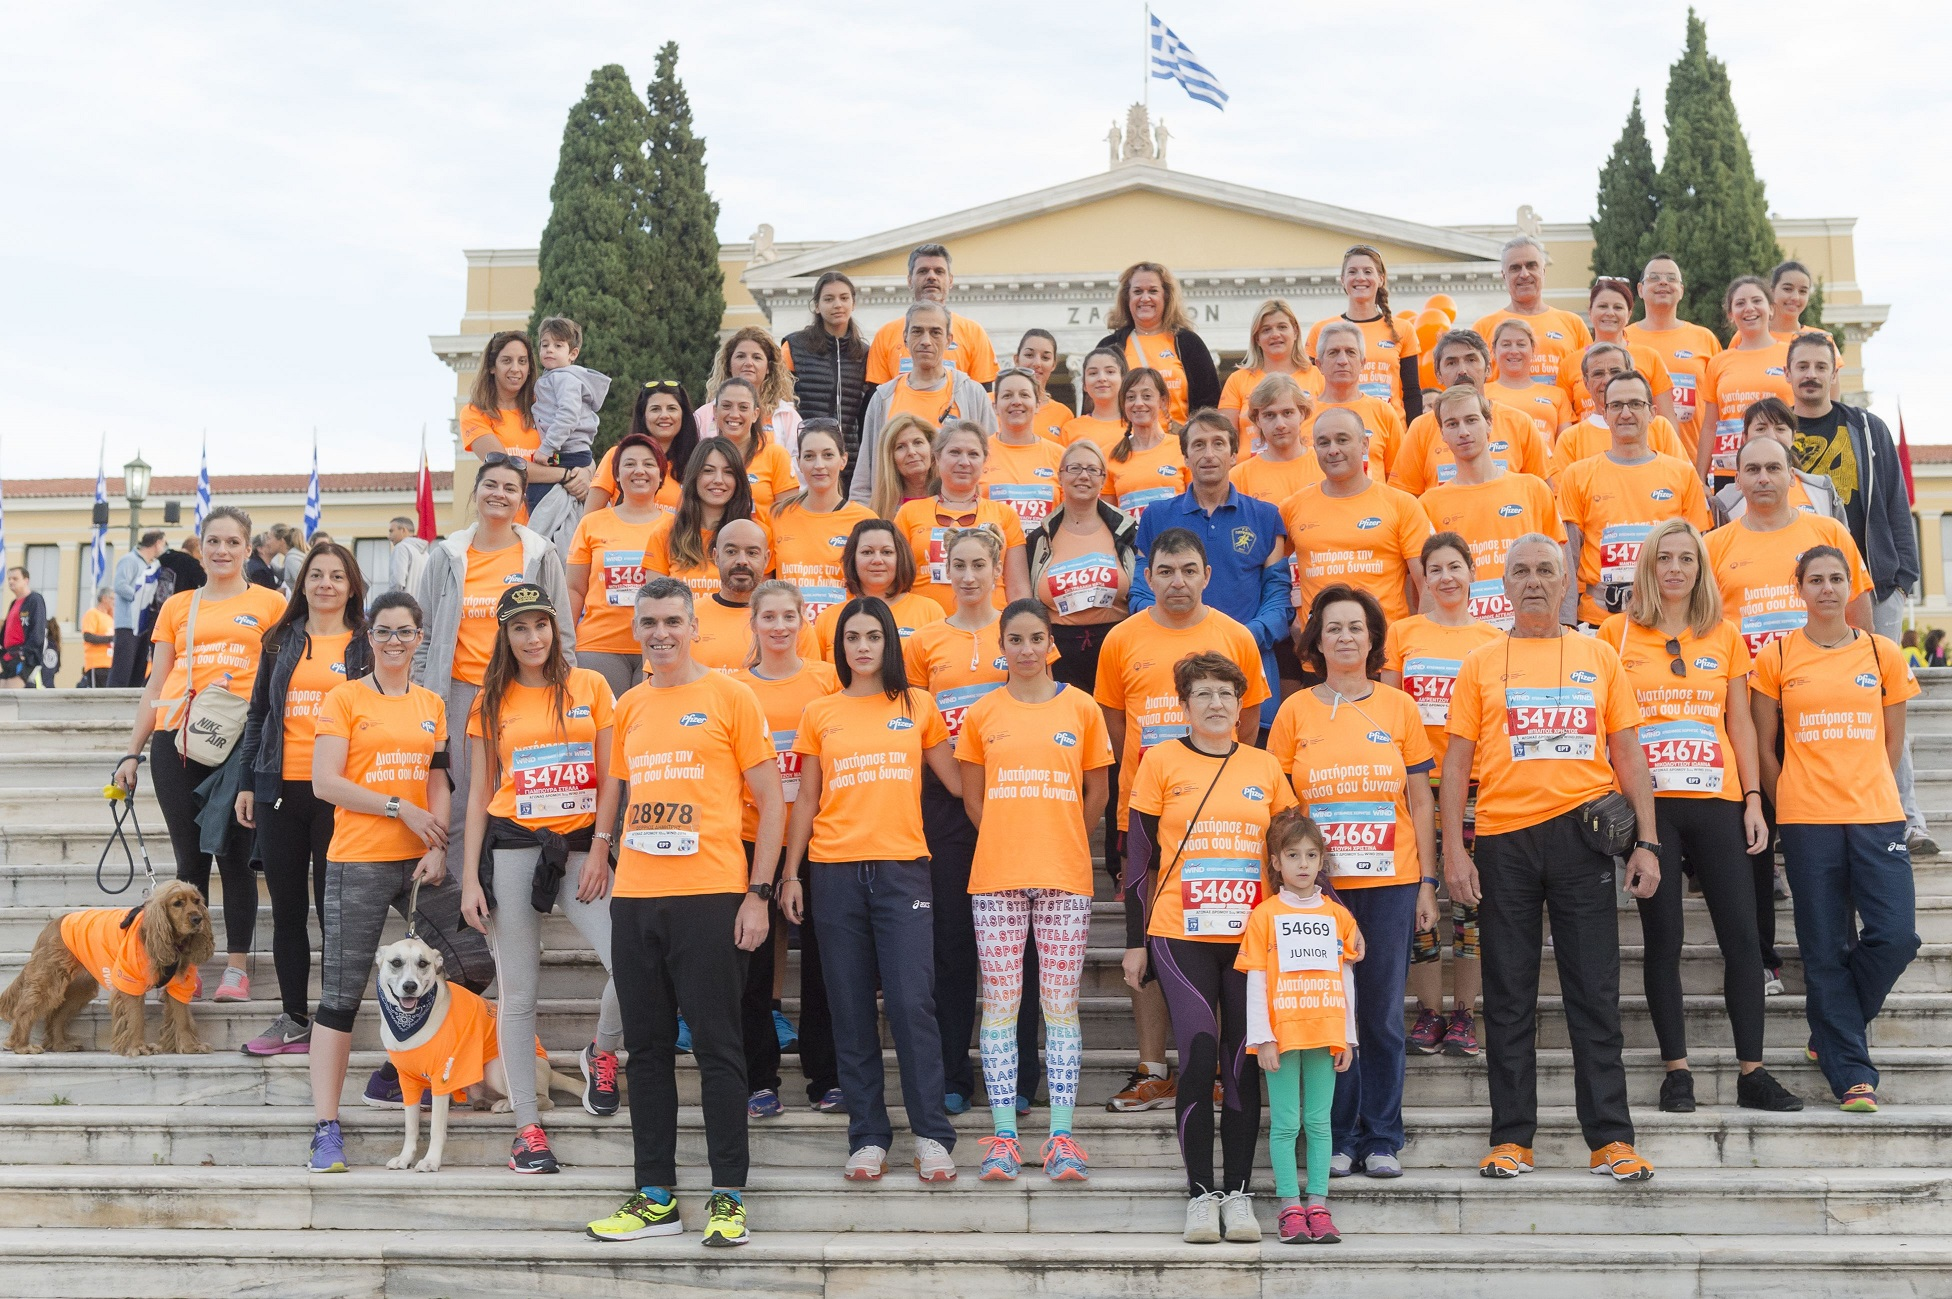 running-team5km